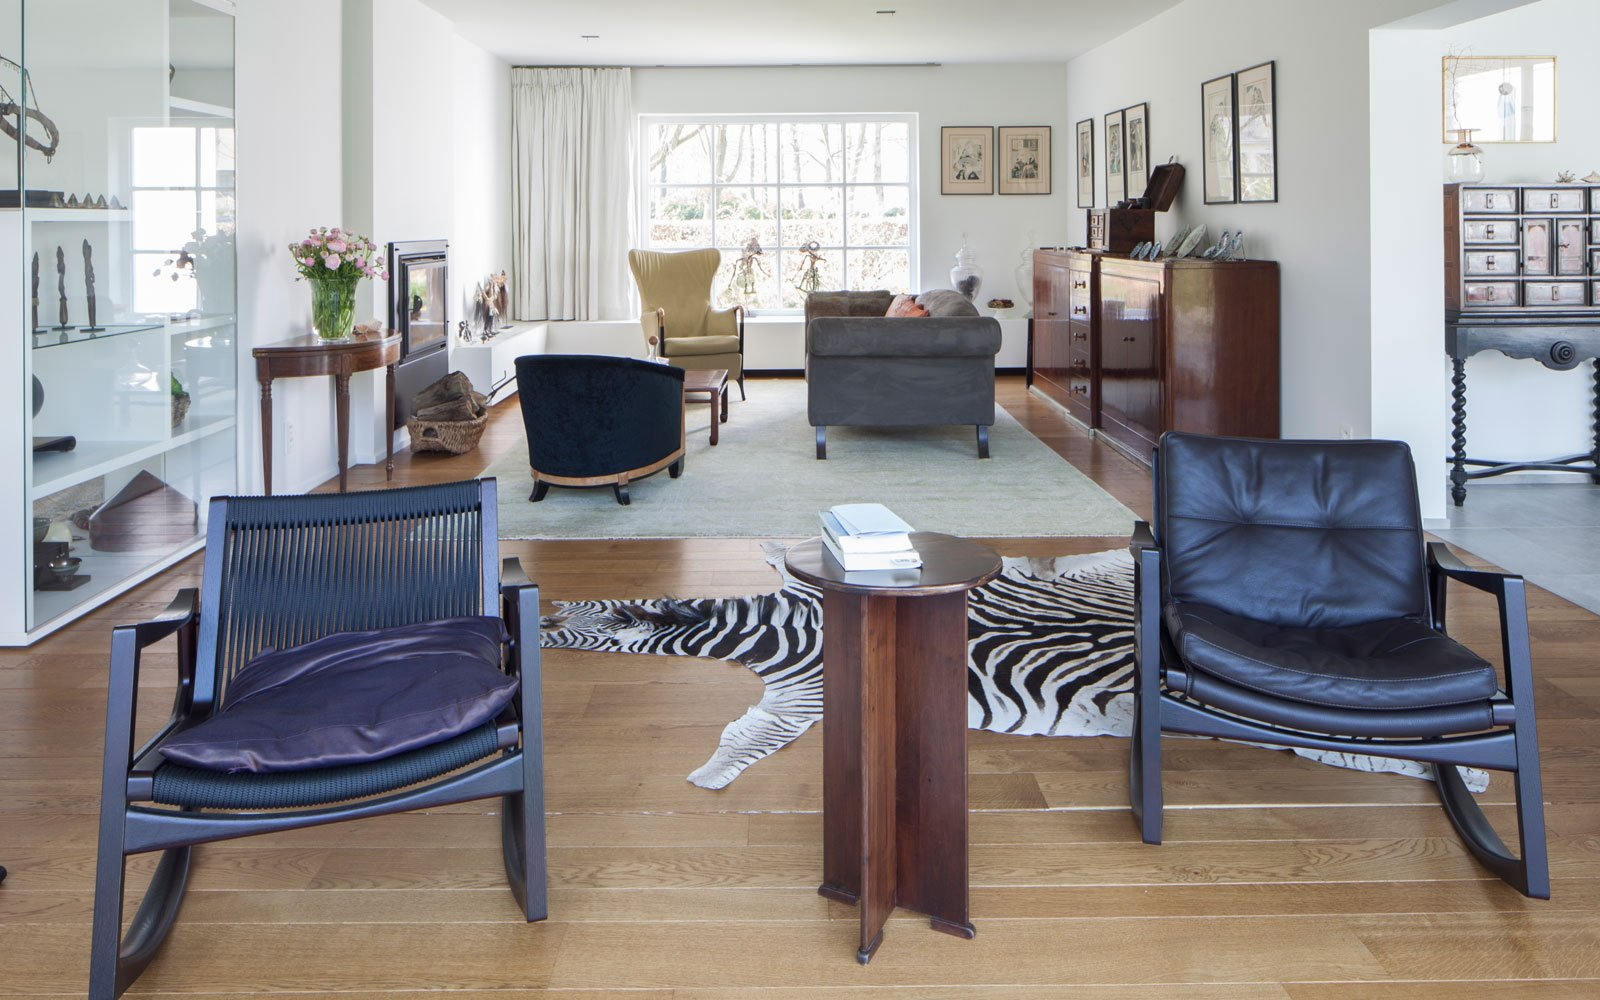 Woonkamer, houten vloer, parket, zebrahuid, tapijt, meubilair, Meynen Interieurarchitectuur, lichtinval, renovatie, p.ed architecten